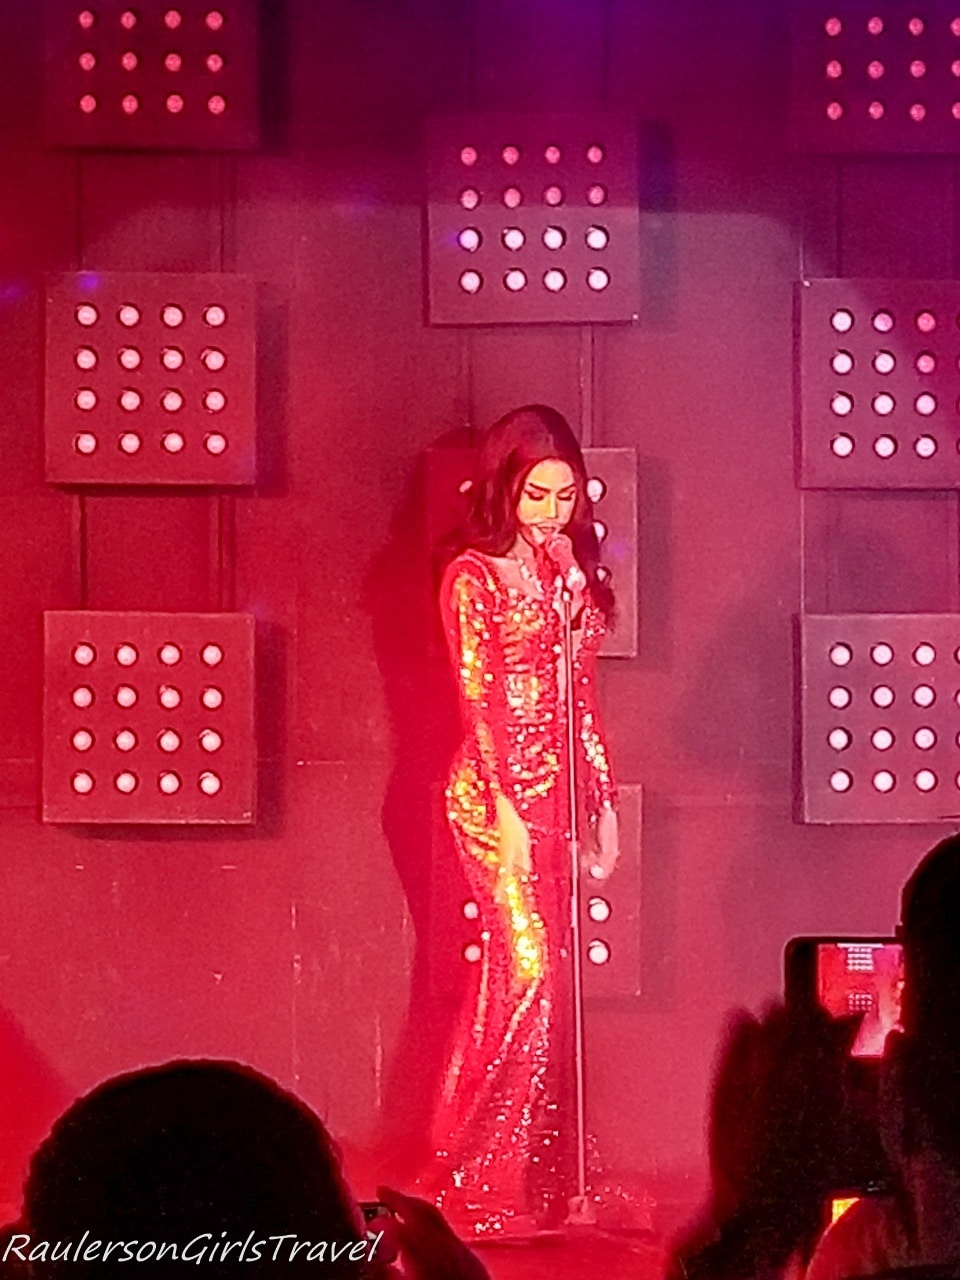 Solo Cabaret lipsync performance